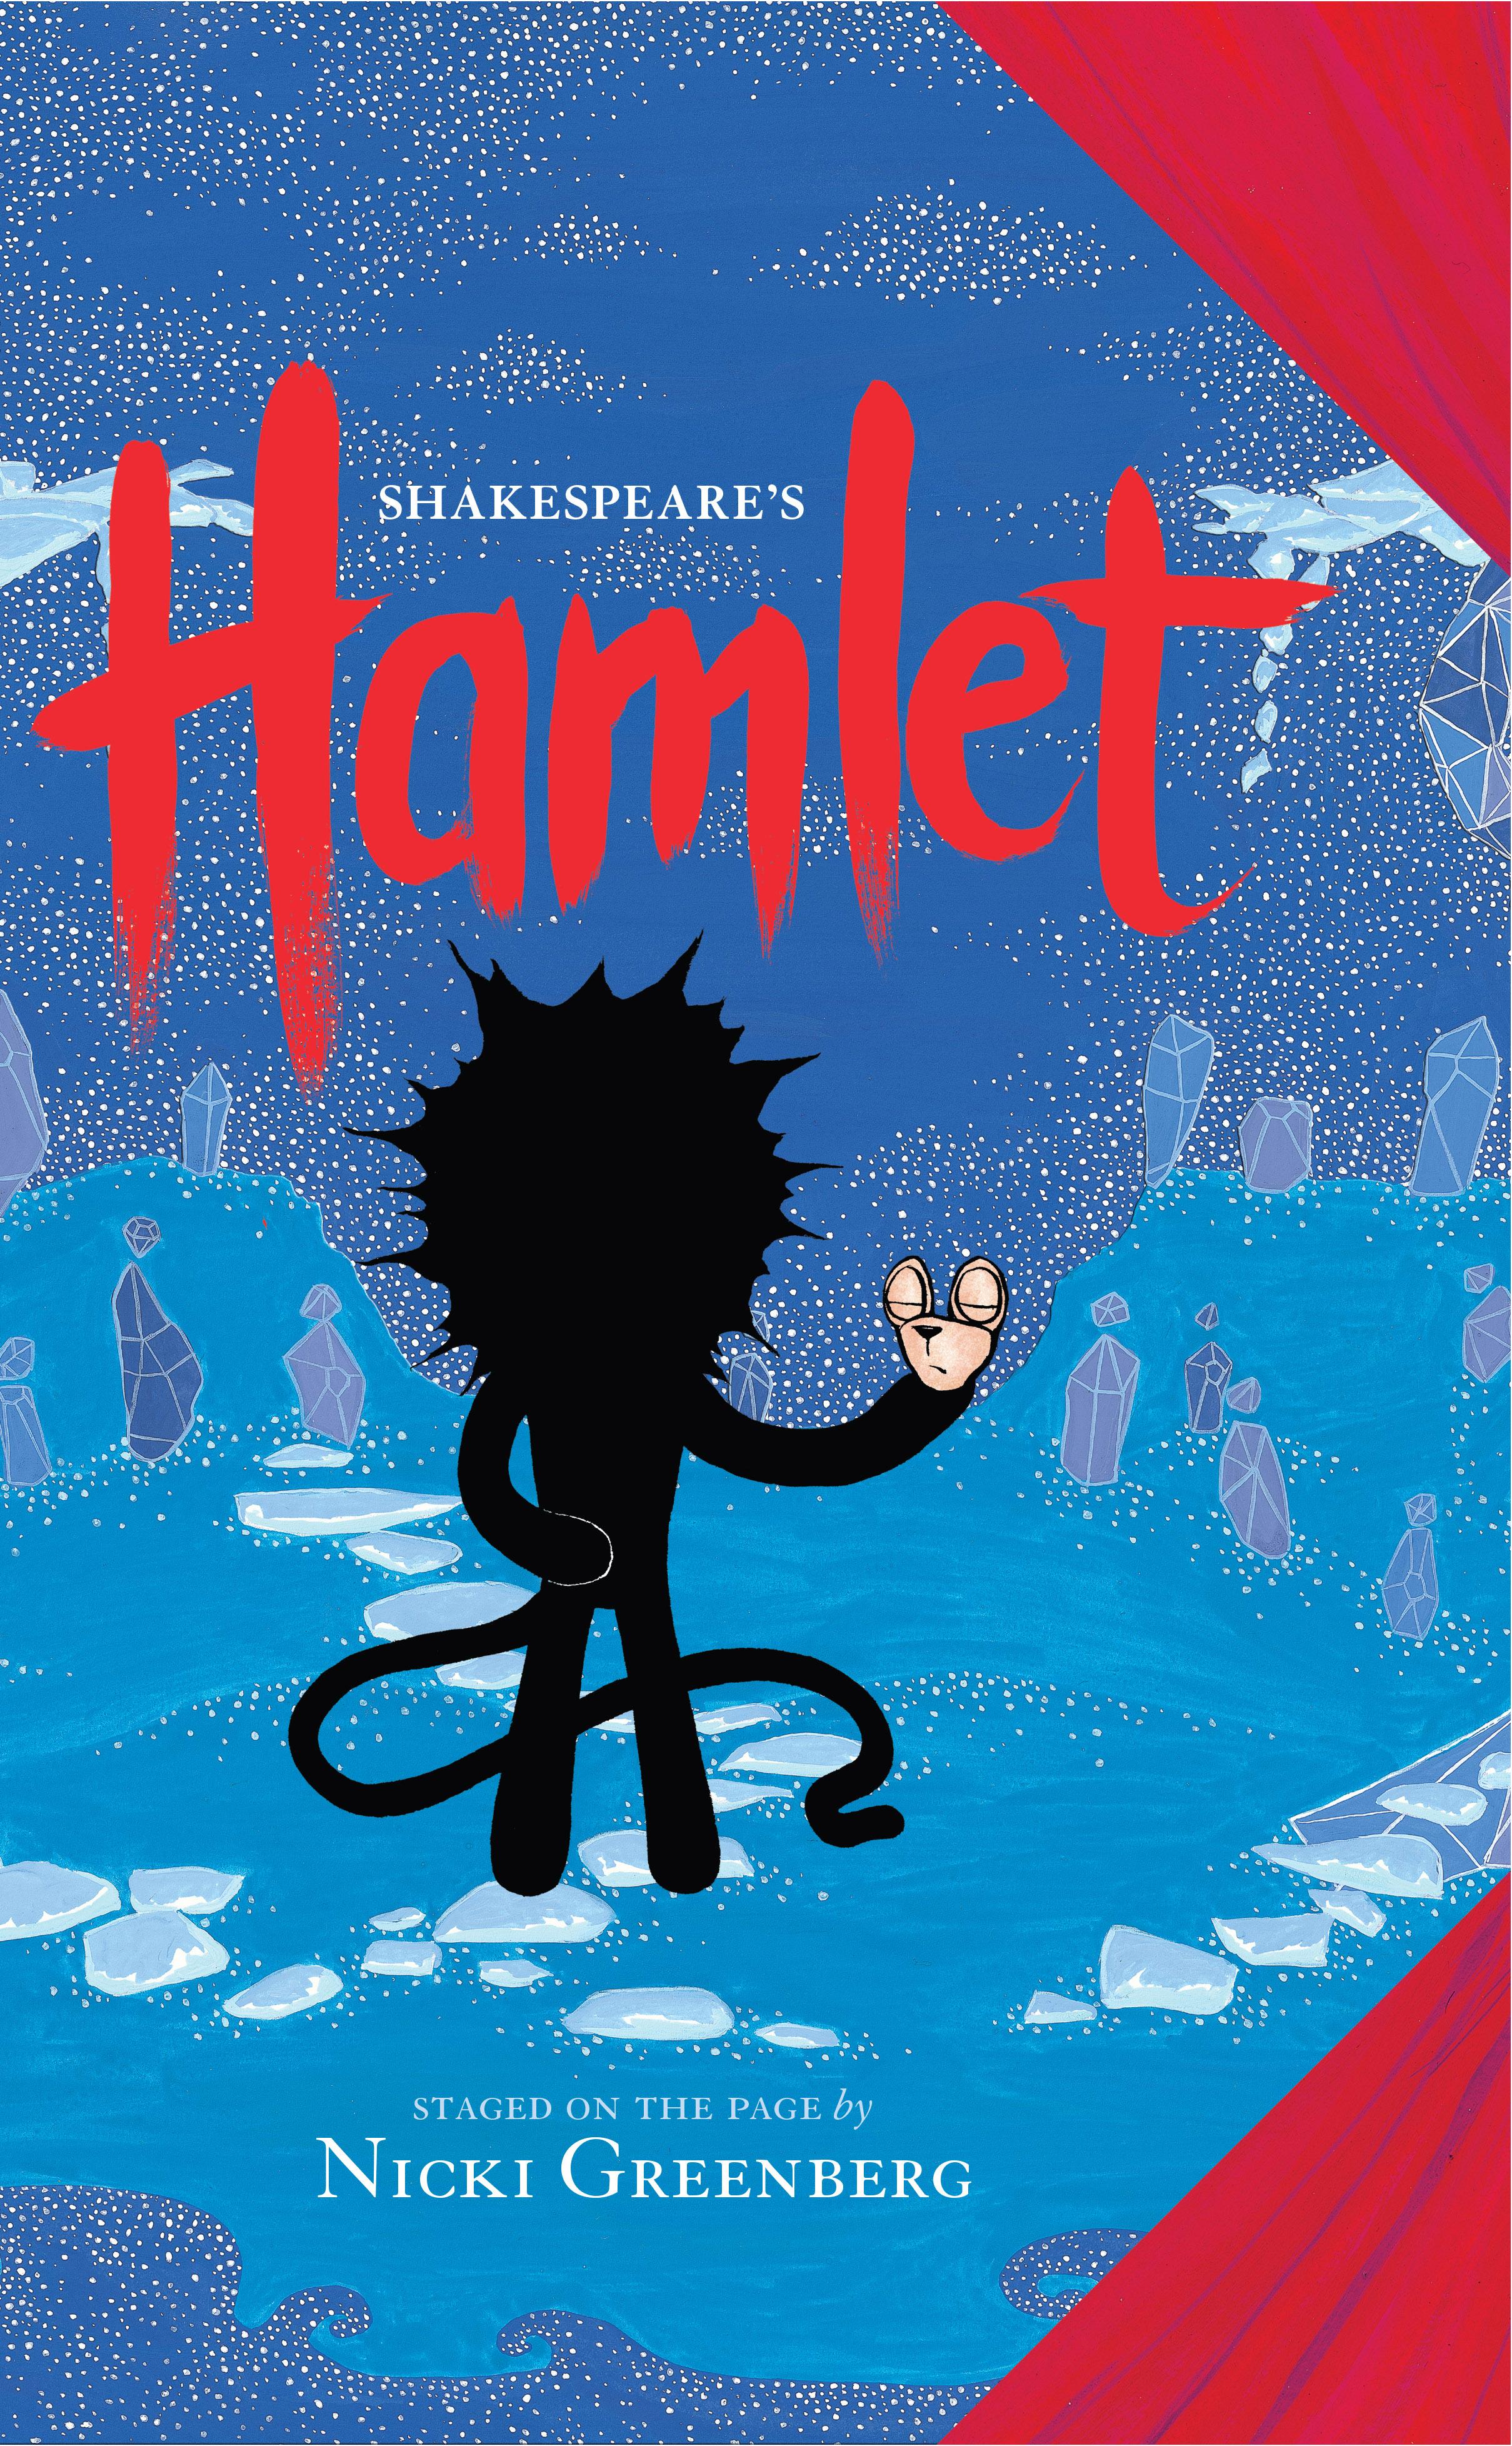 I need help with writing Hamlet essay? Please?